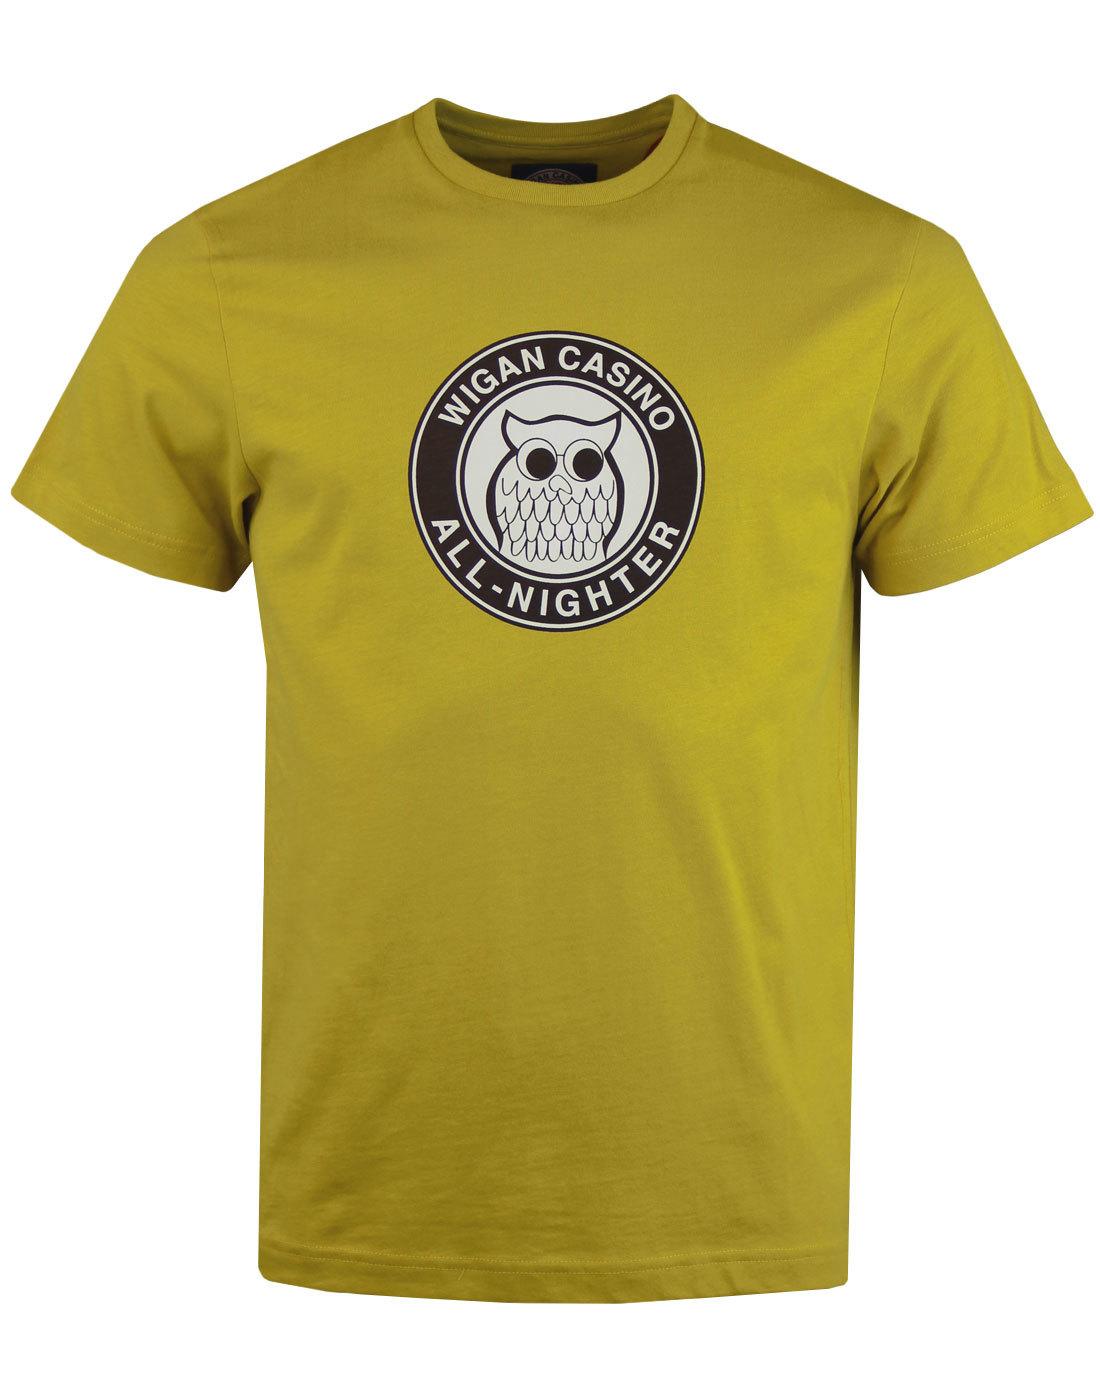 Wigan casino night owl t-shirt barcelona casino dress code